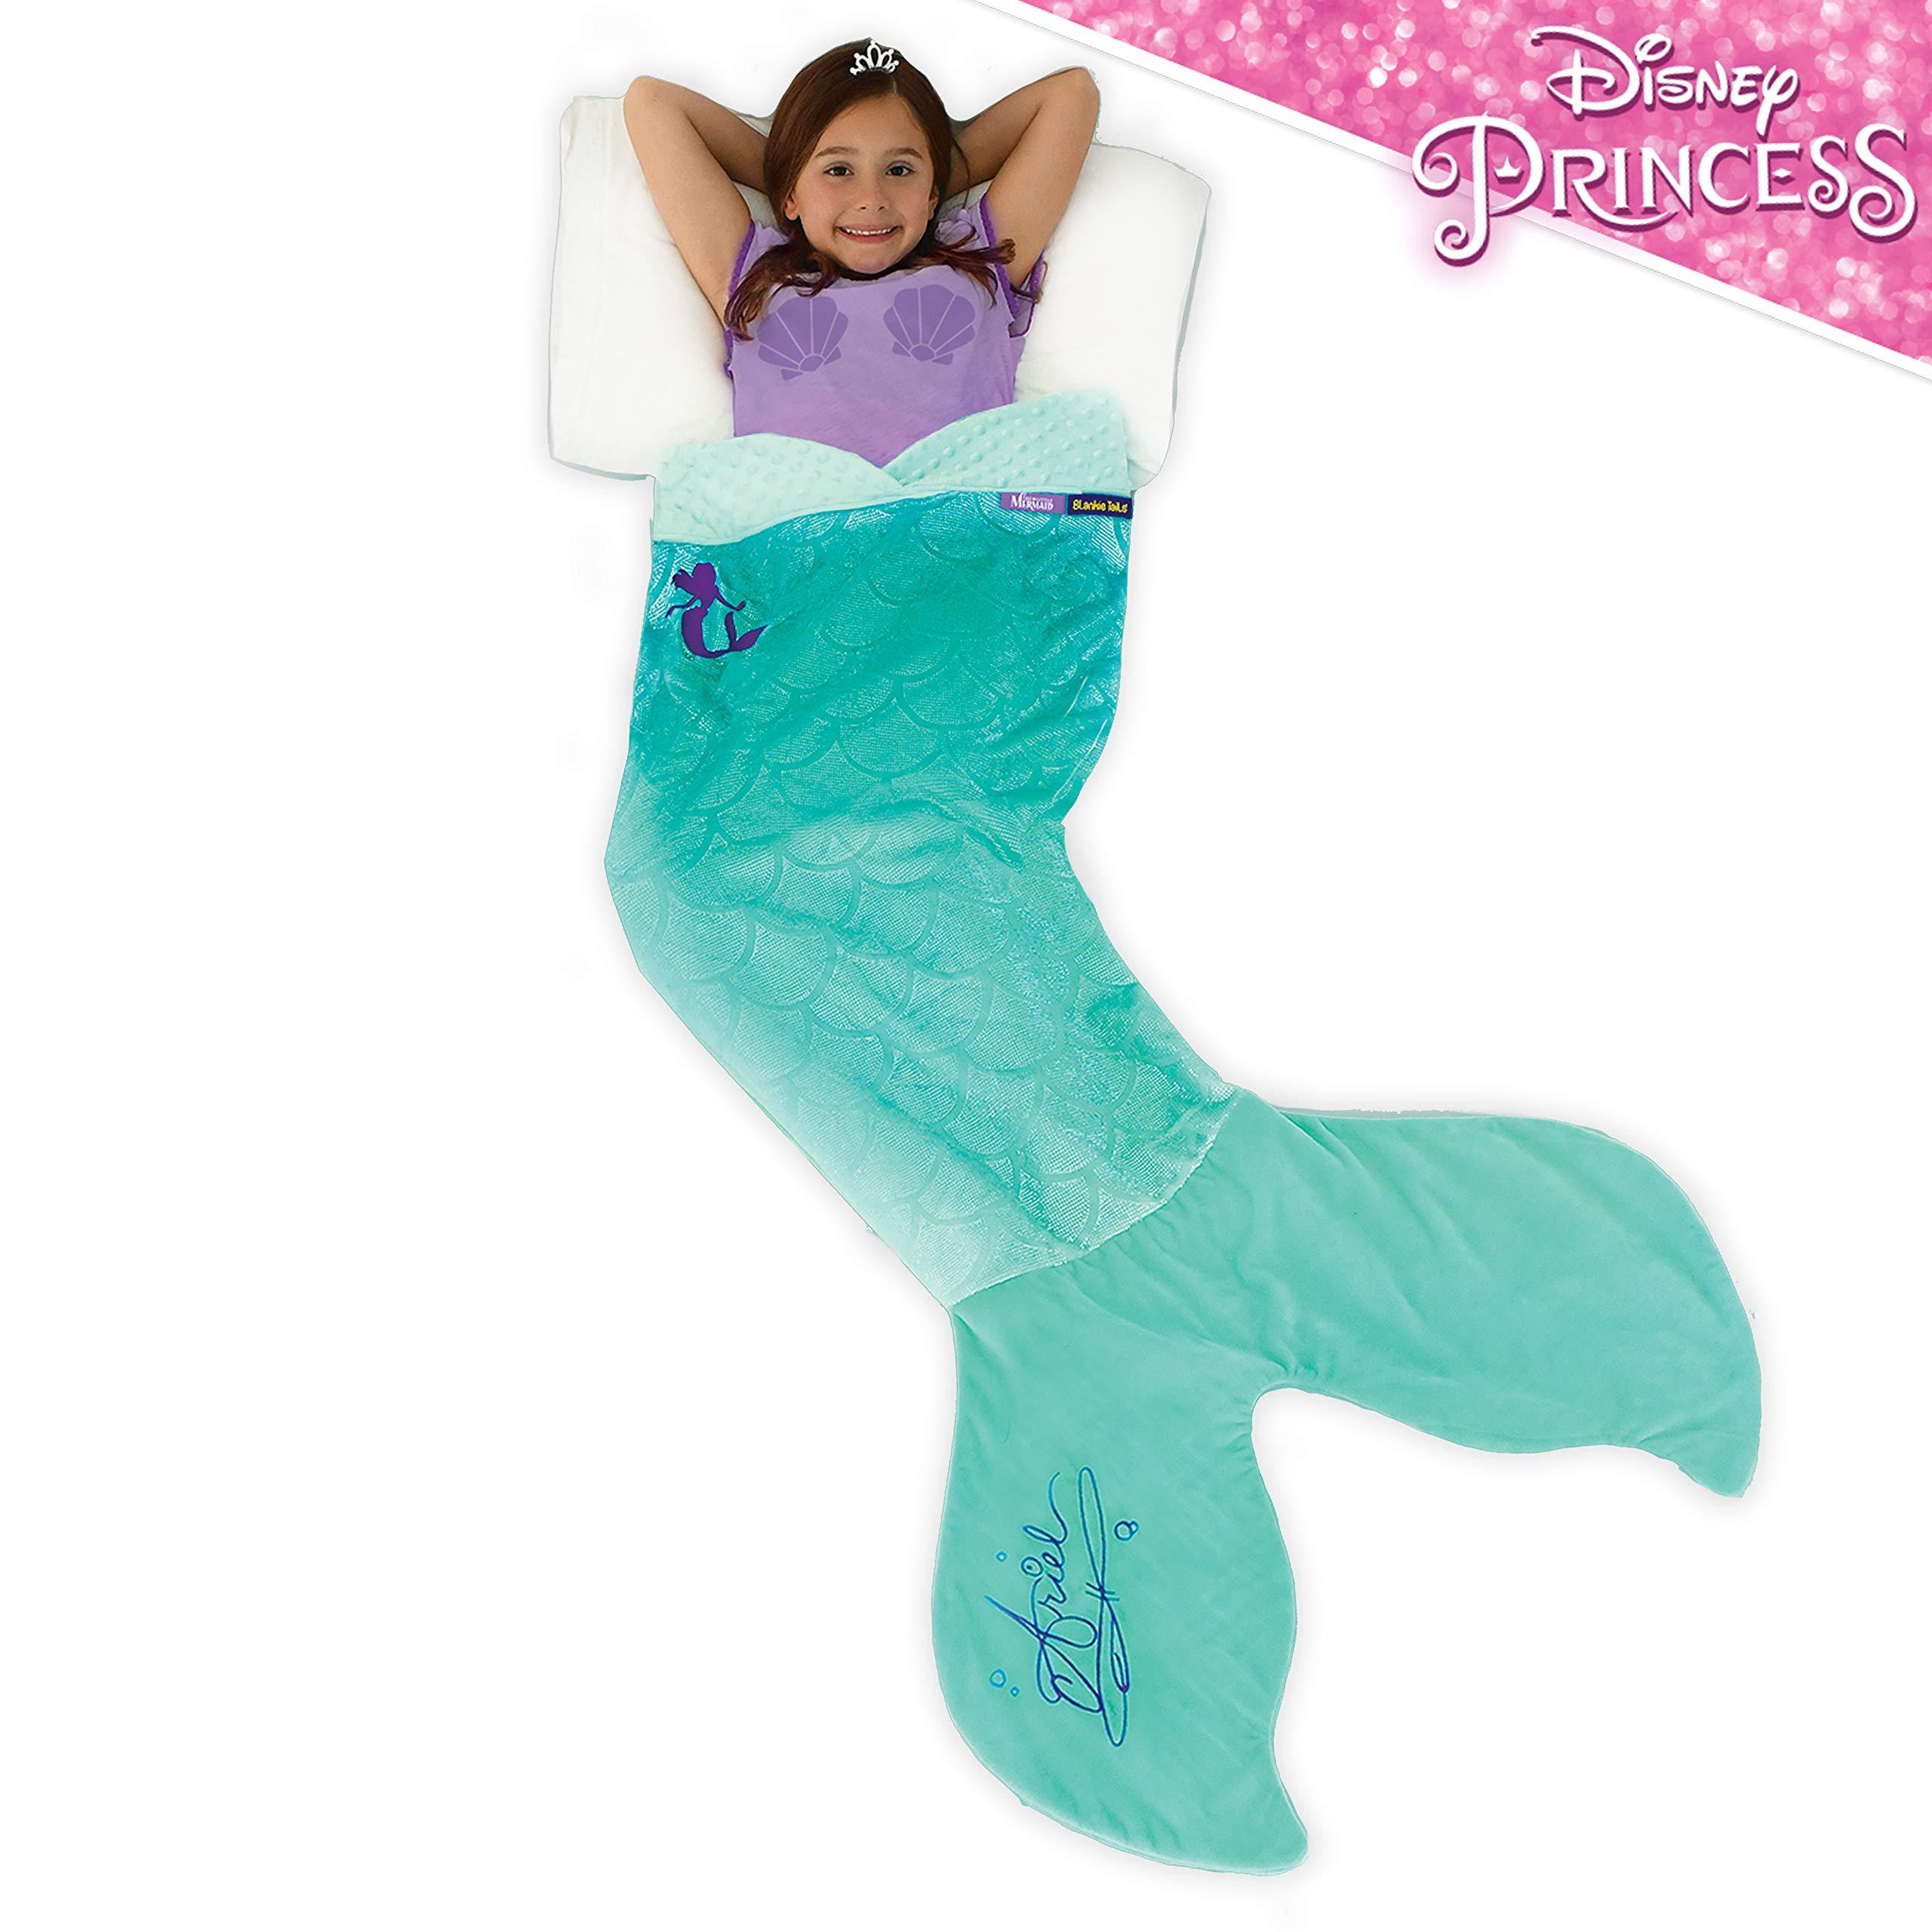 Blankie Tails Disney The Little Mermaid Ariel Mermaid Blanket by Blankie Tails